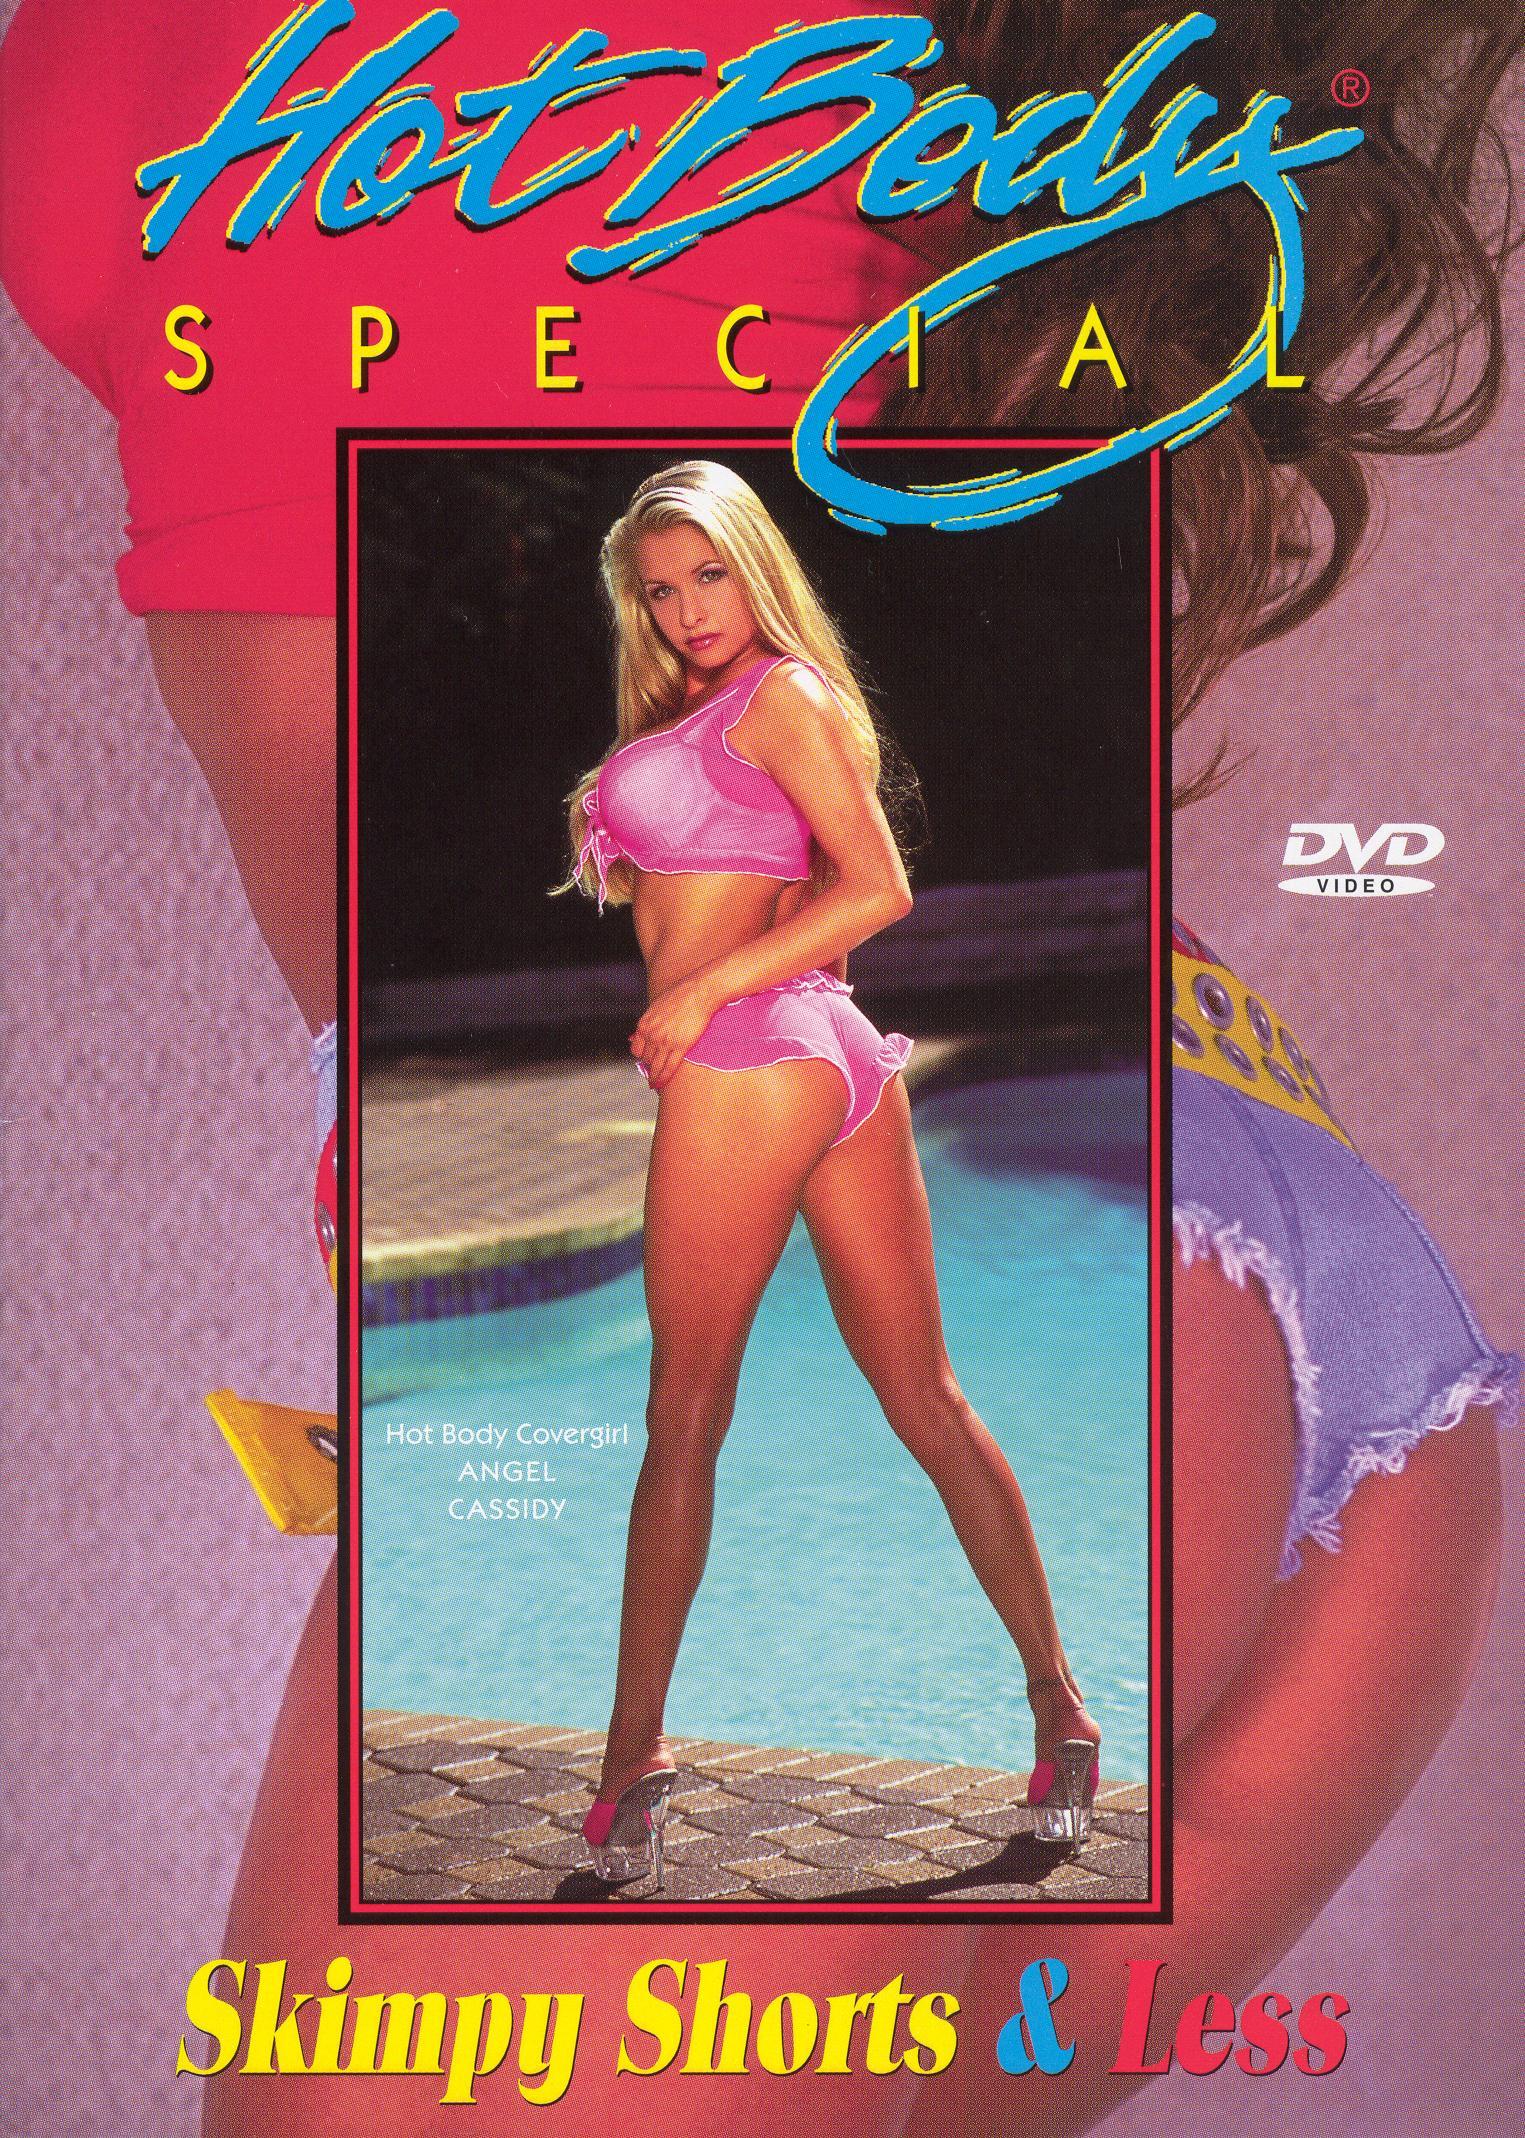 Hot Body Special: Skimpy Shorts & Less